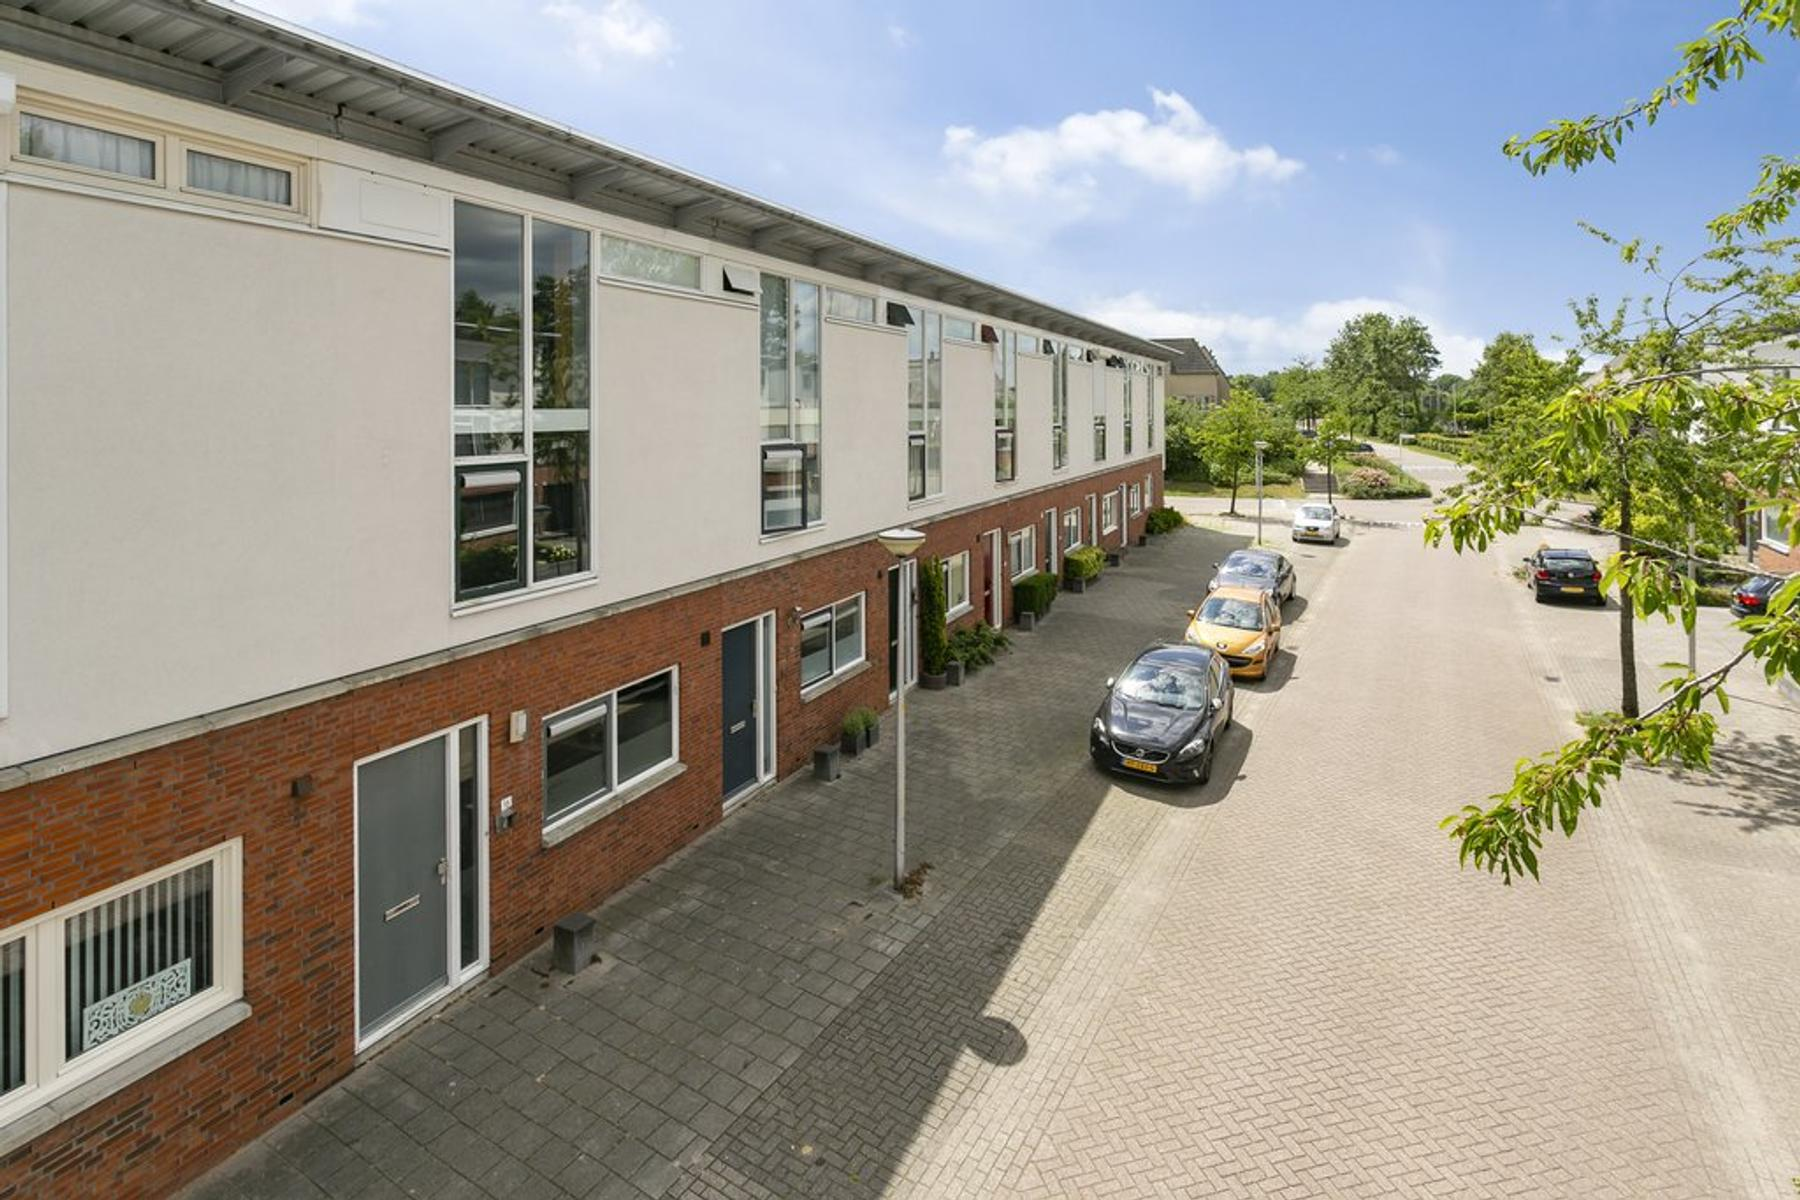 Annette Versluysstraat 16 in Deventer 7421 LB